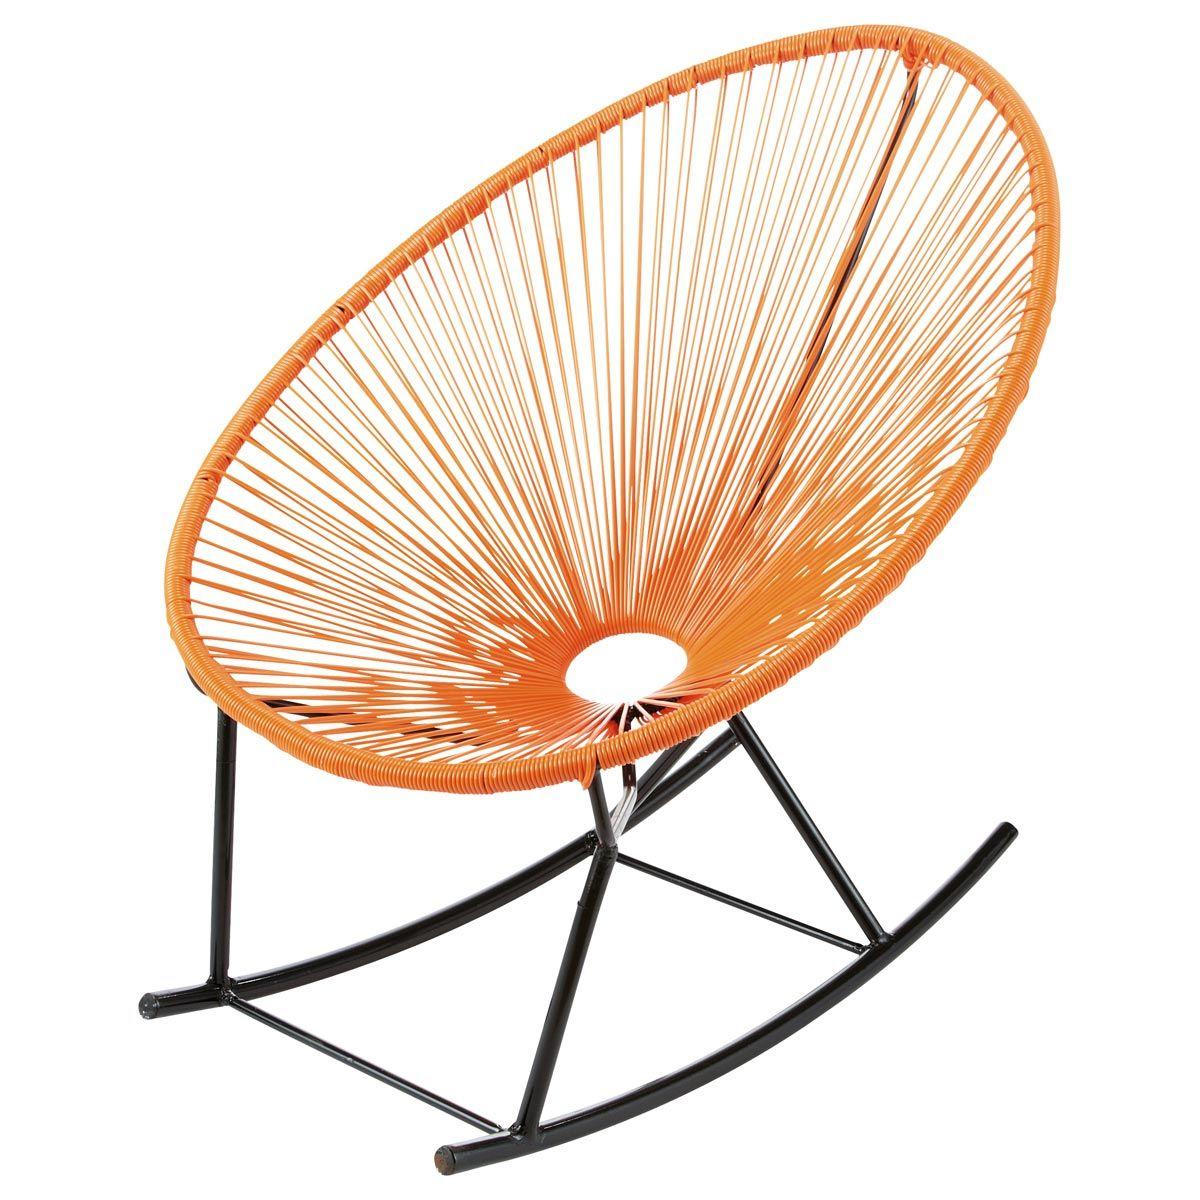 oranje tuin schommelstoel copacabana 89 maisons du monde. Black Bedroom Furniture Sets. Home Design Ideas